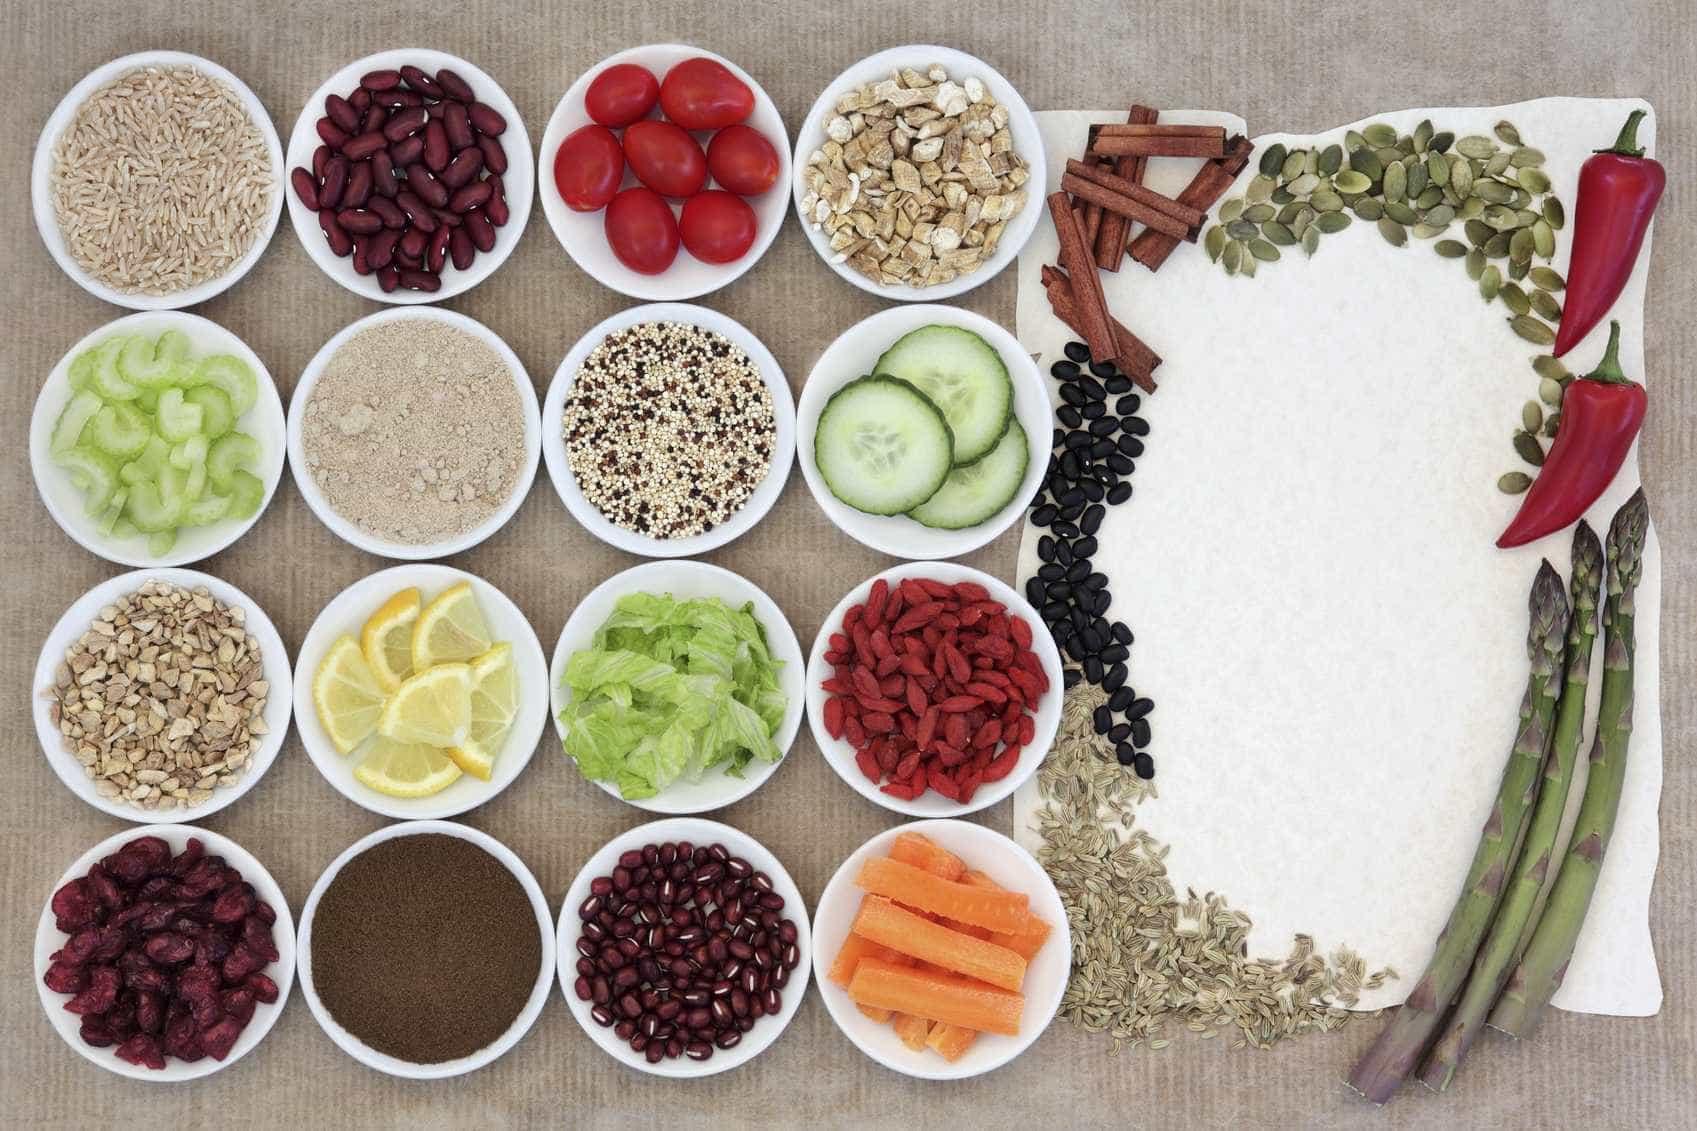 Estes alimentos têm poucos hidratos de carbono -